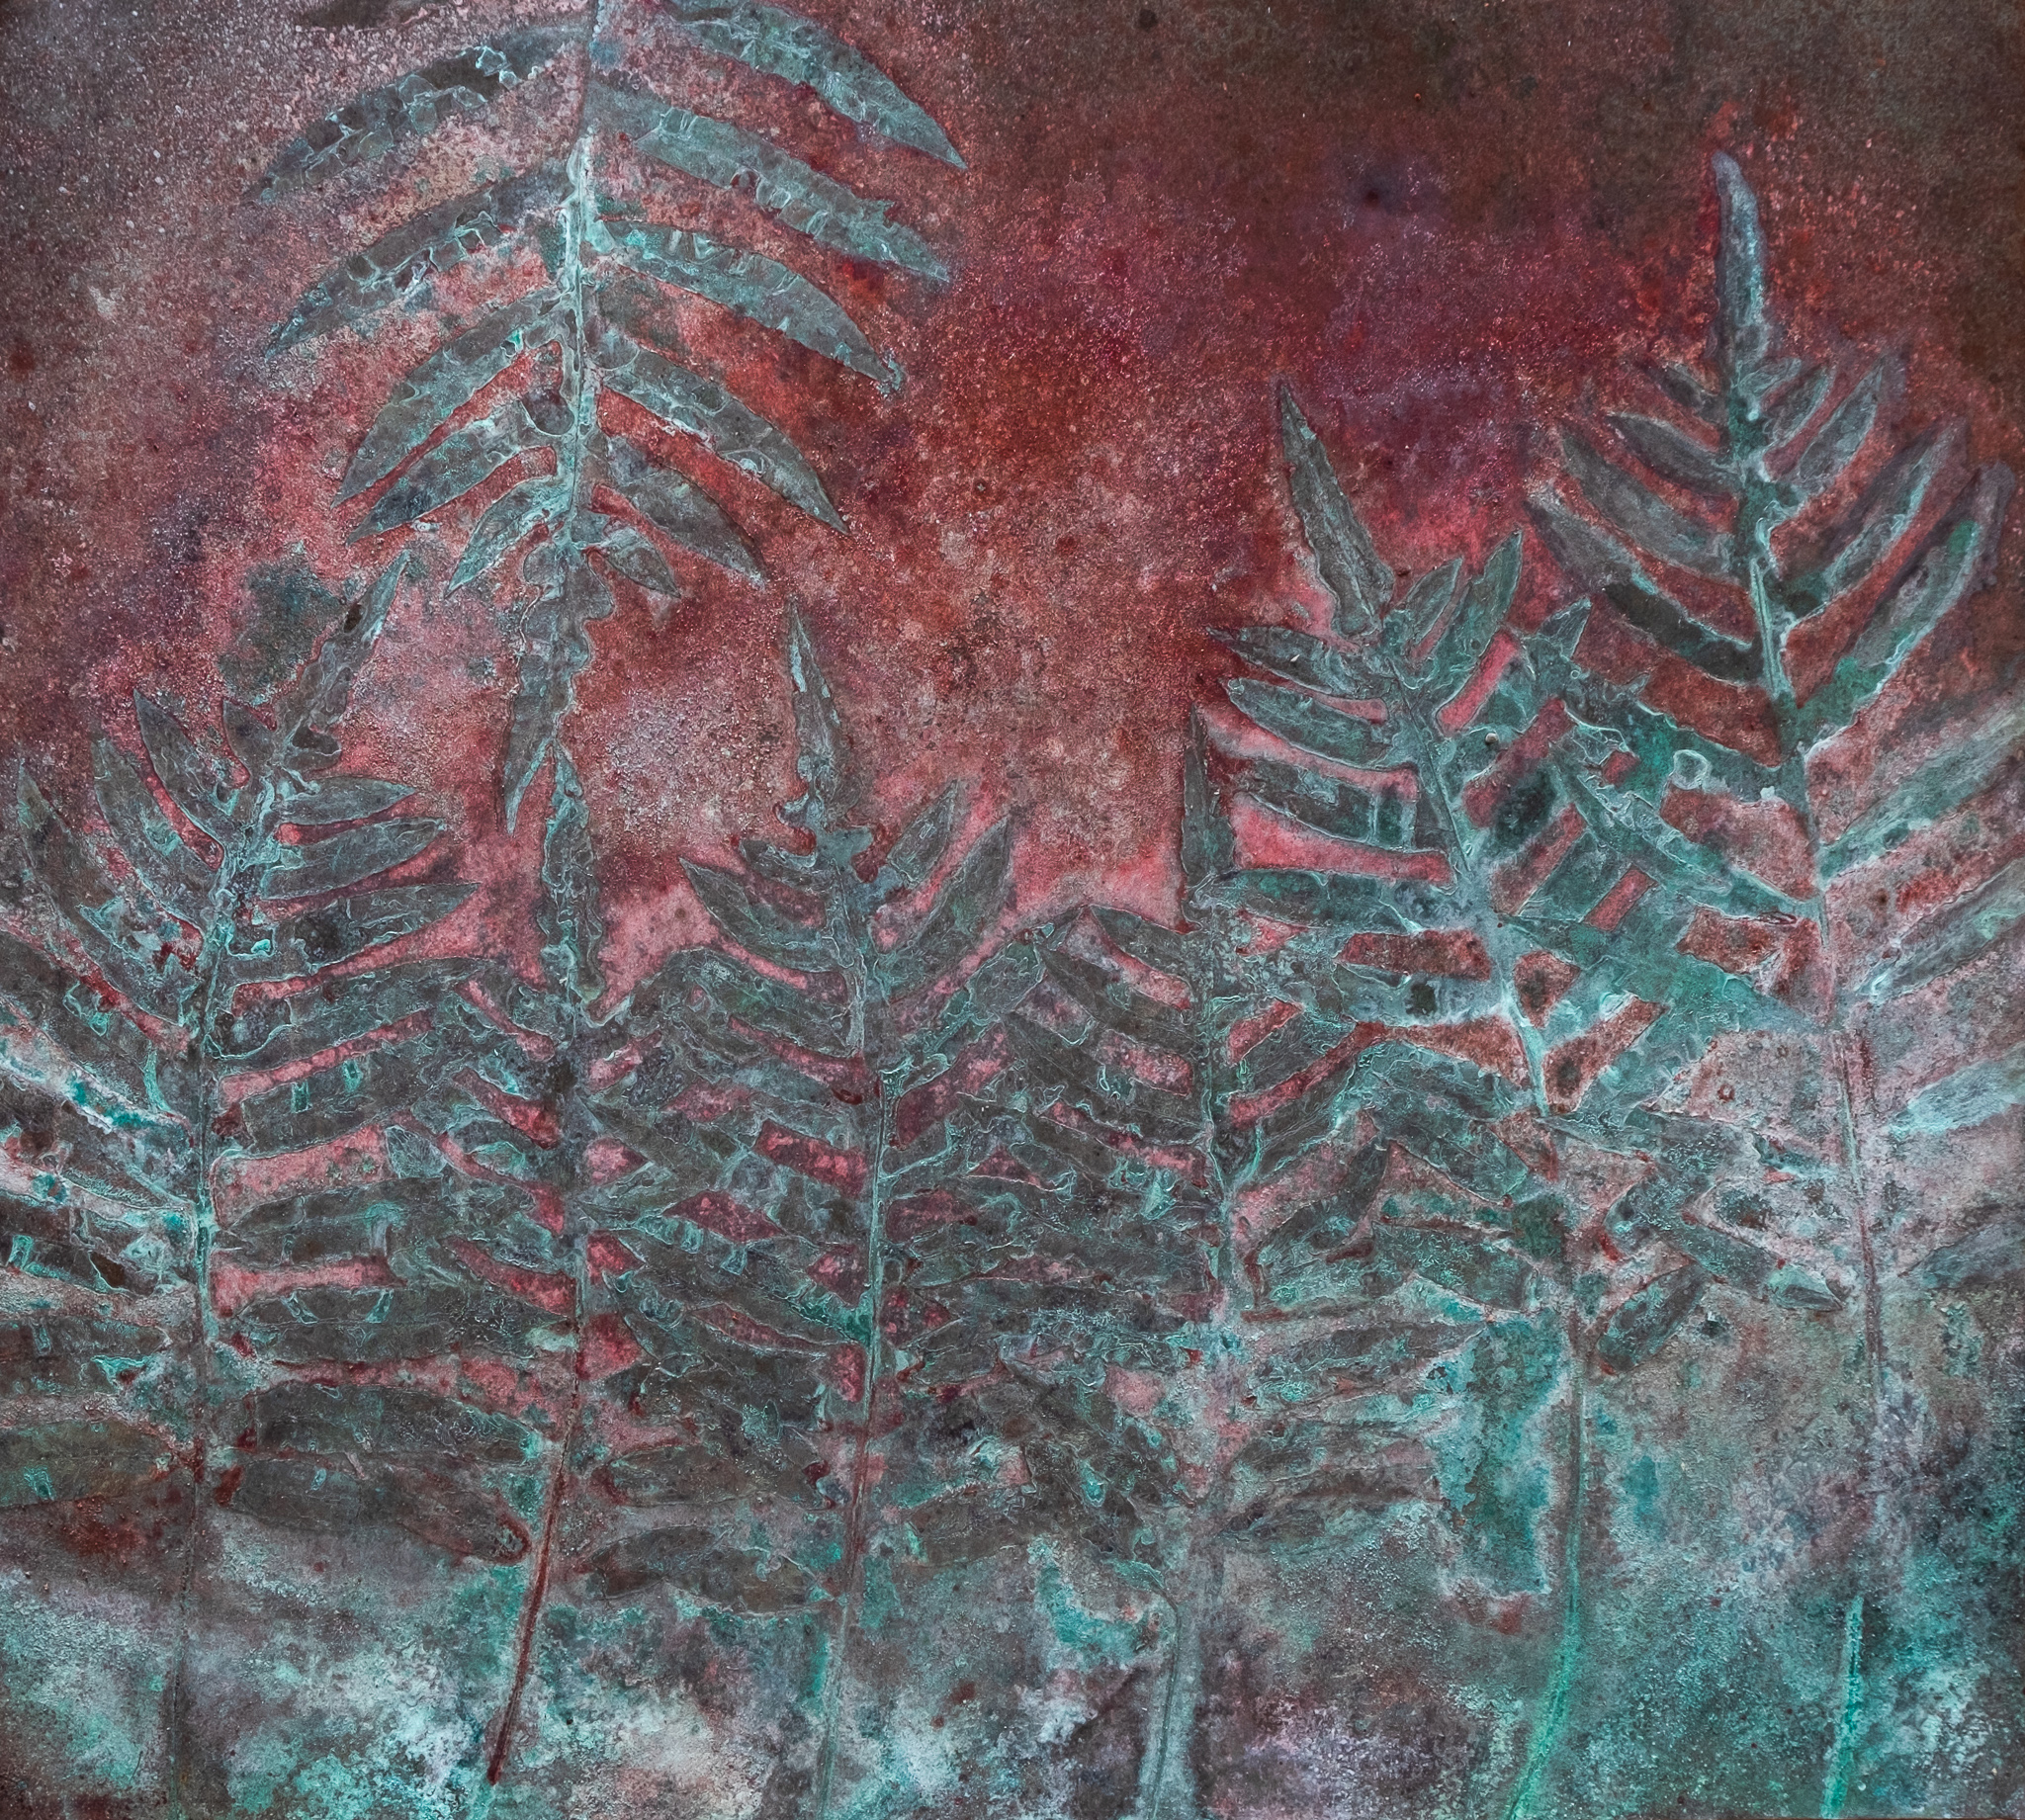 sanford-mcgee-copper-art-tennessee-ferns-blue-red.jpg